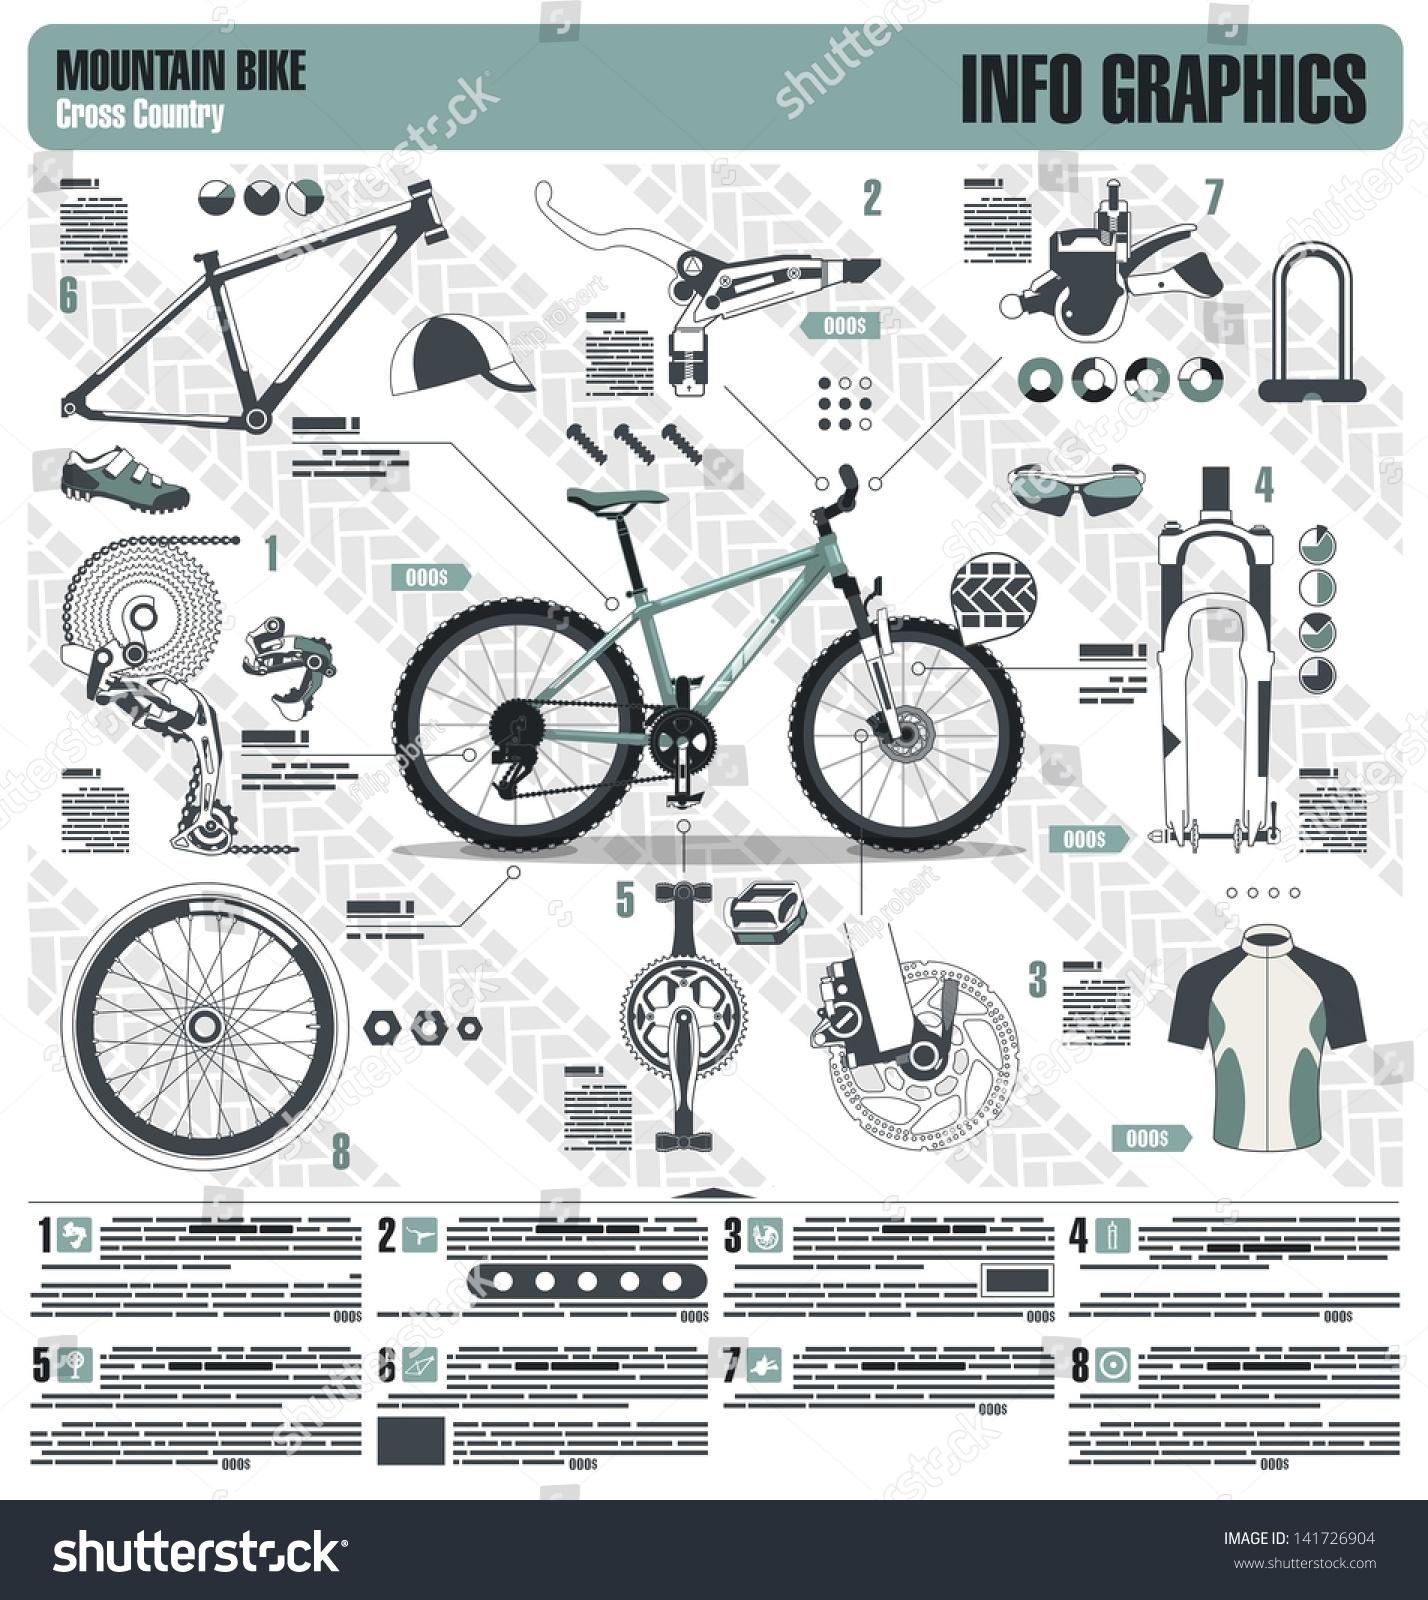 Mountain Bike Info Graphic Elements Vector Stock Vector 141726904